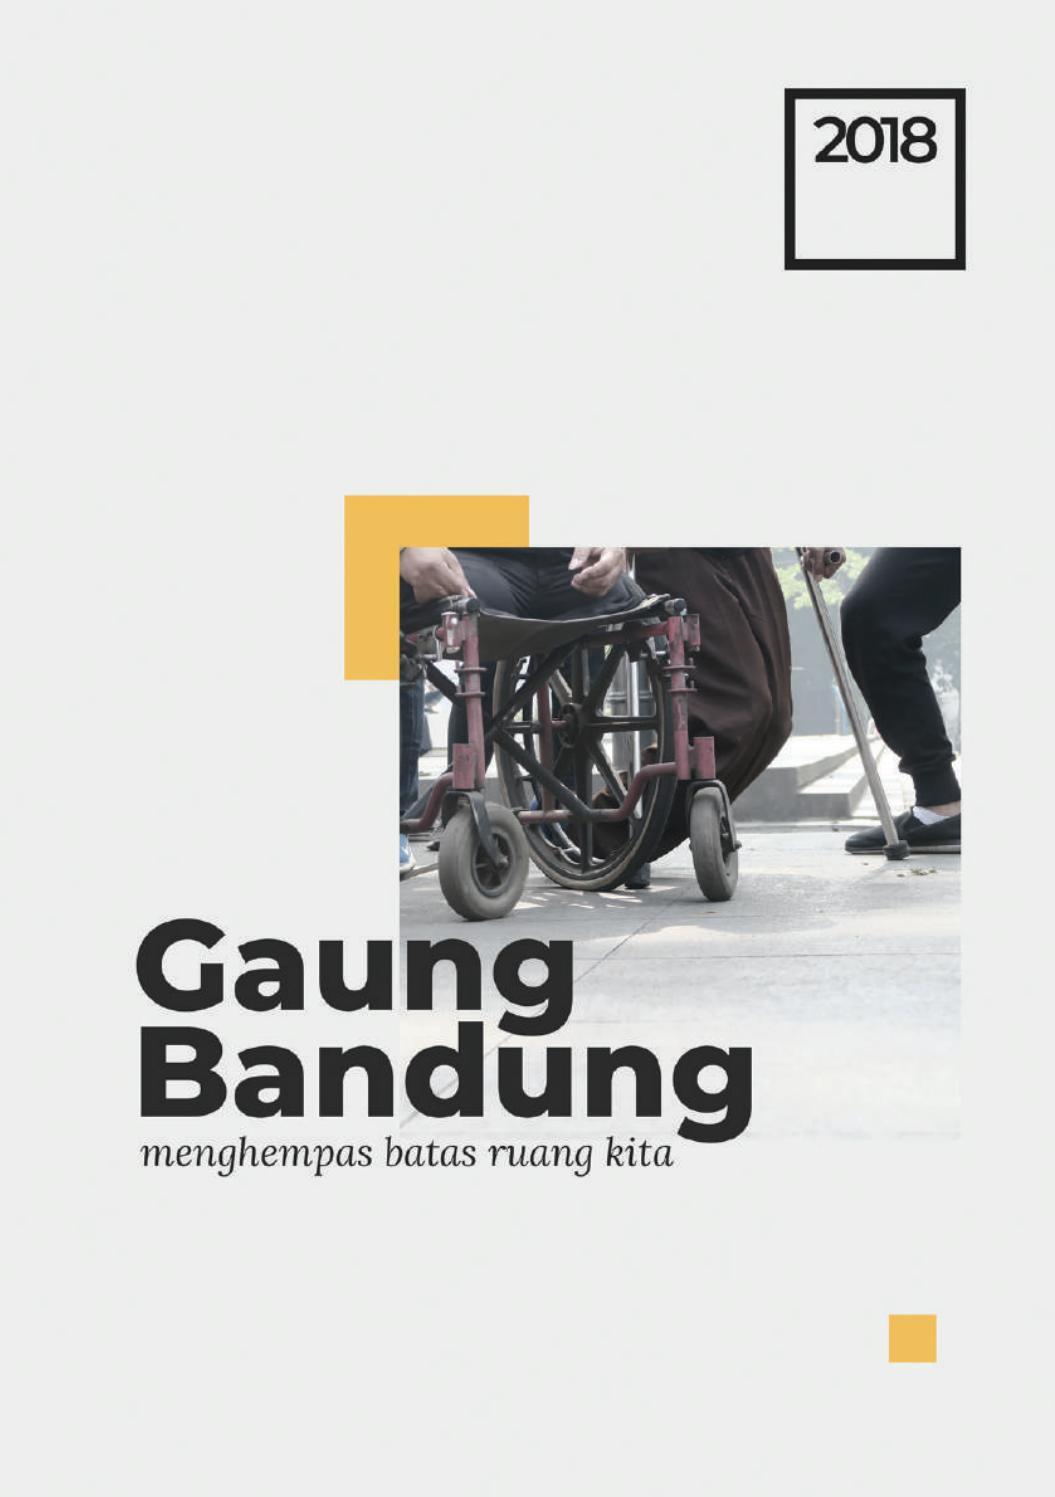 Gaung Bandung 2018 Menghempas Batas Ruang Kita by Gaung